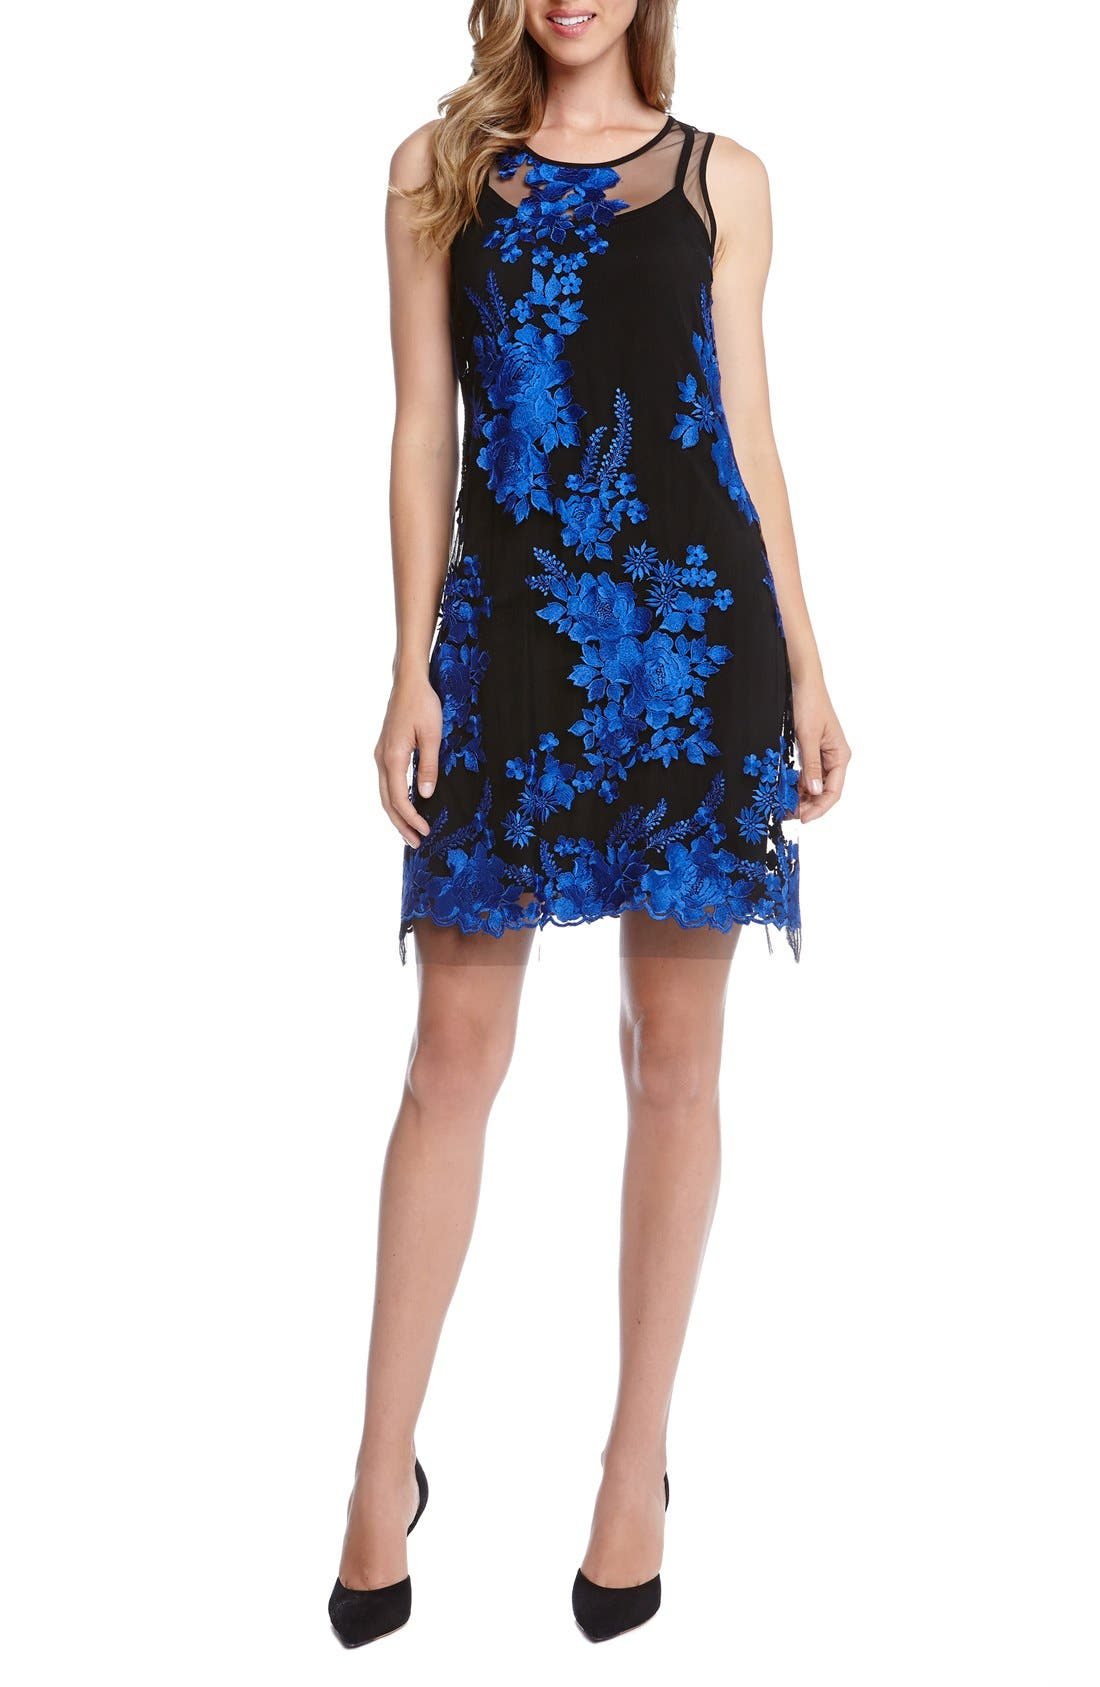 Alternate Image 1 Selected - Karen Kane Embroidered Tulle A-Line Dress